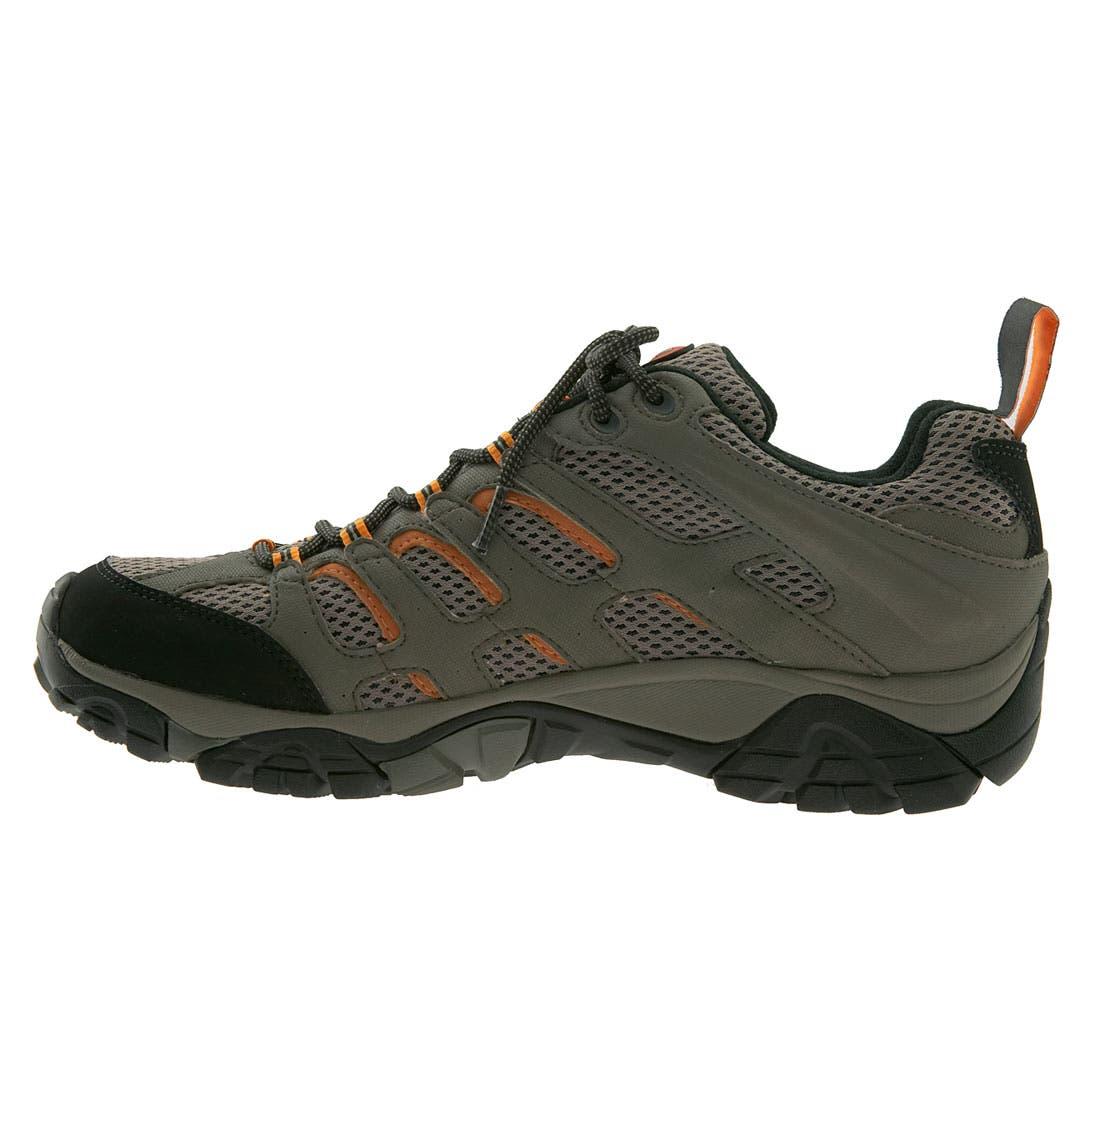 Alternate Image 2  - Merrell 'Moab GTX XCR' Hiking Shoe (Men)